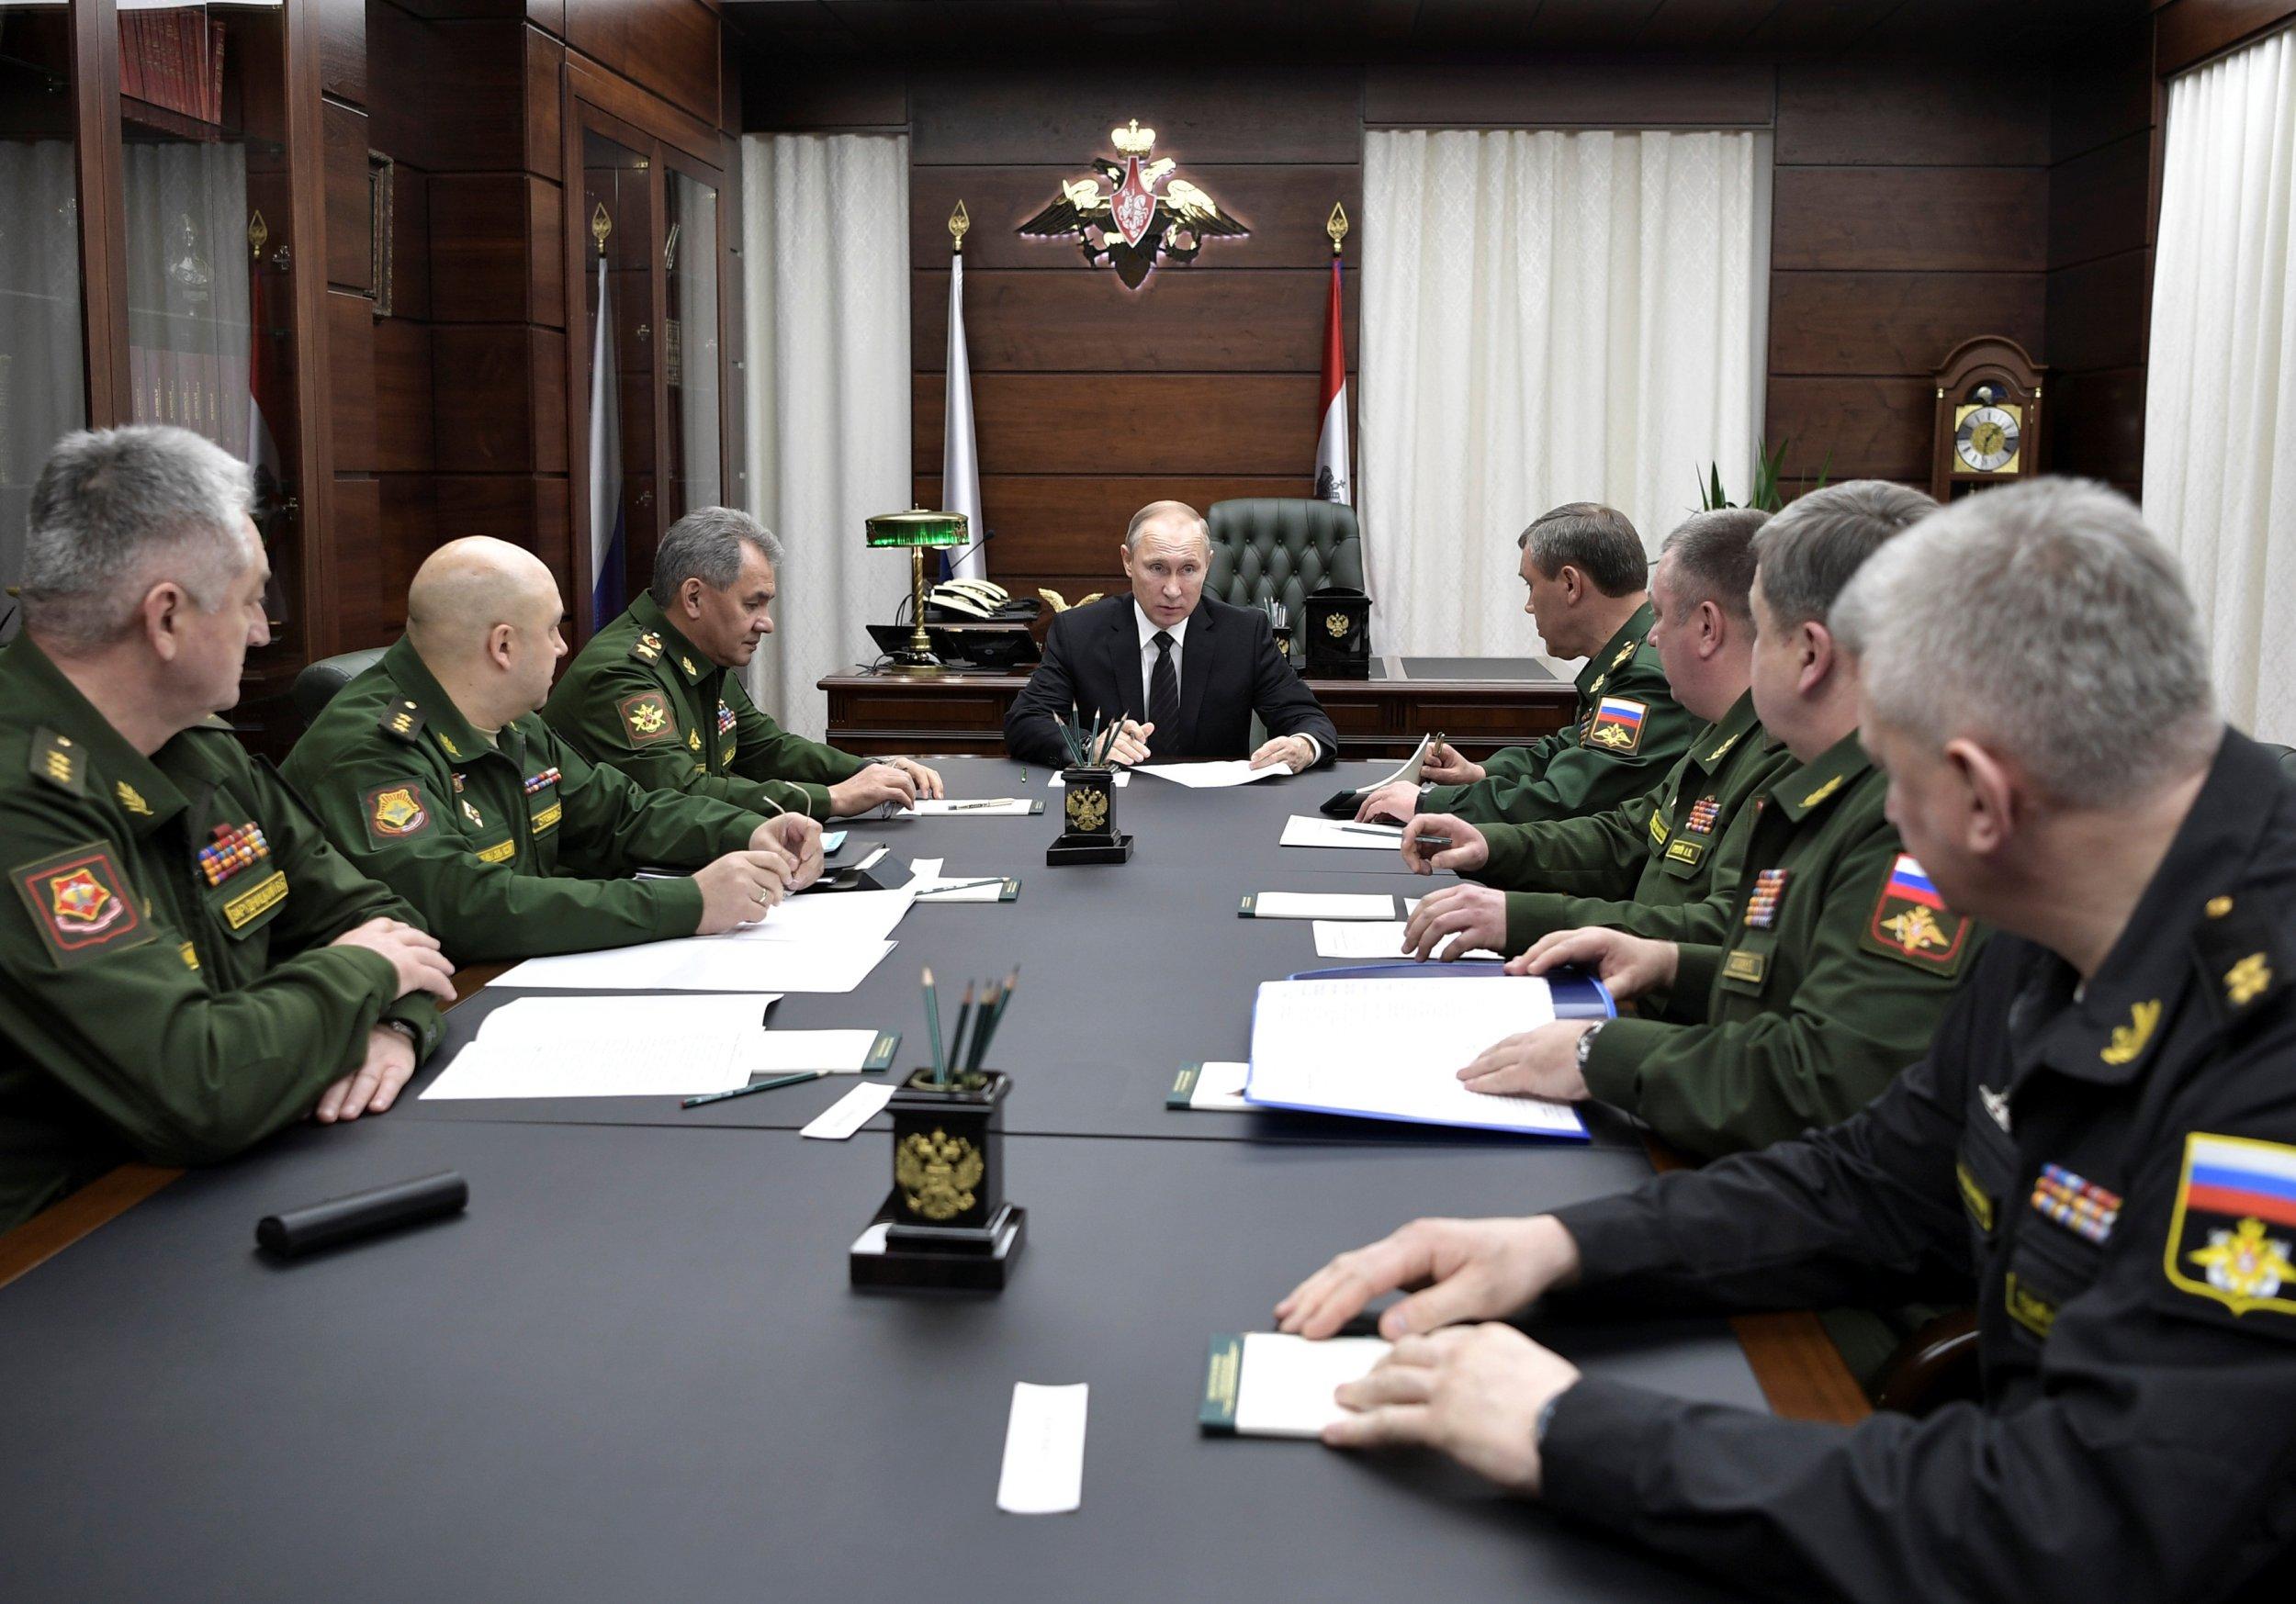 Putin and defense brass